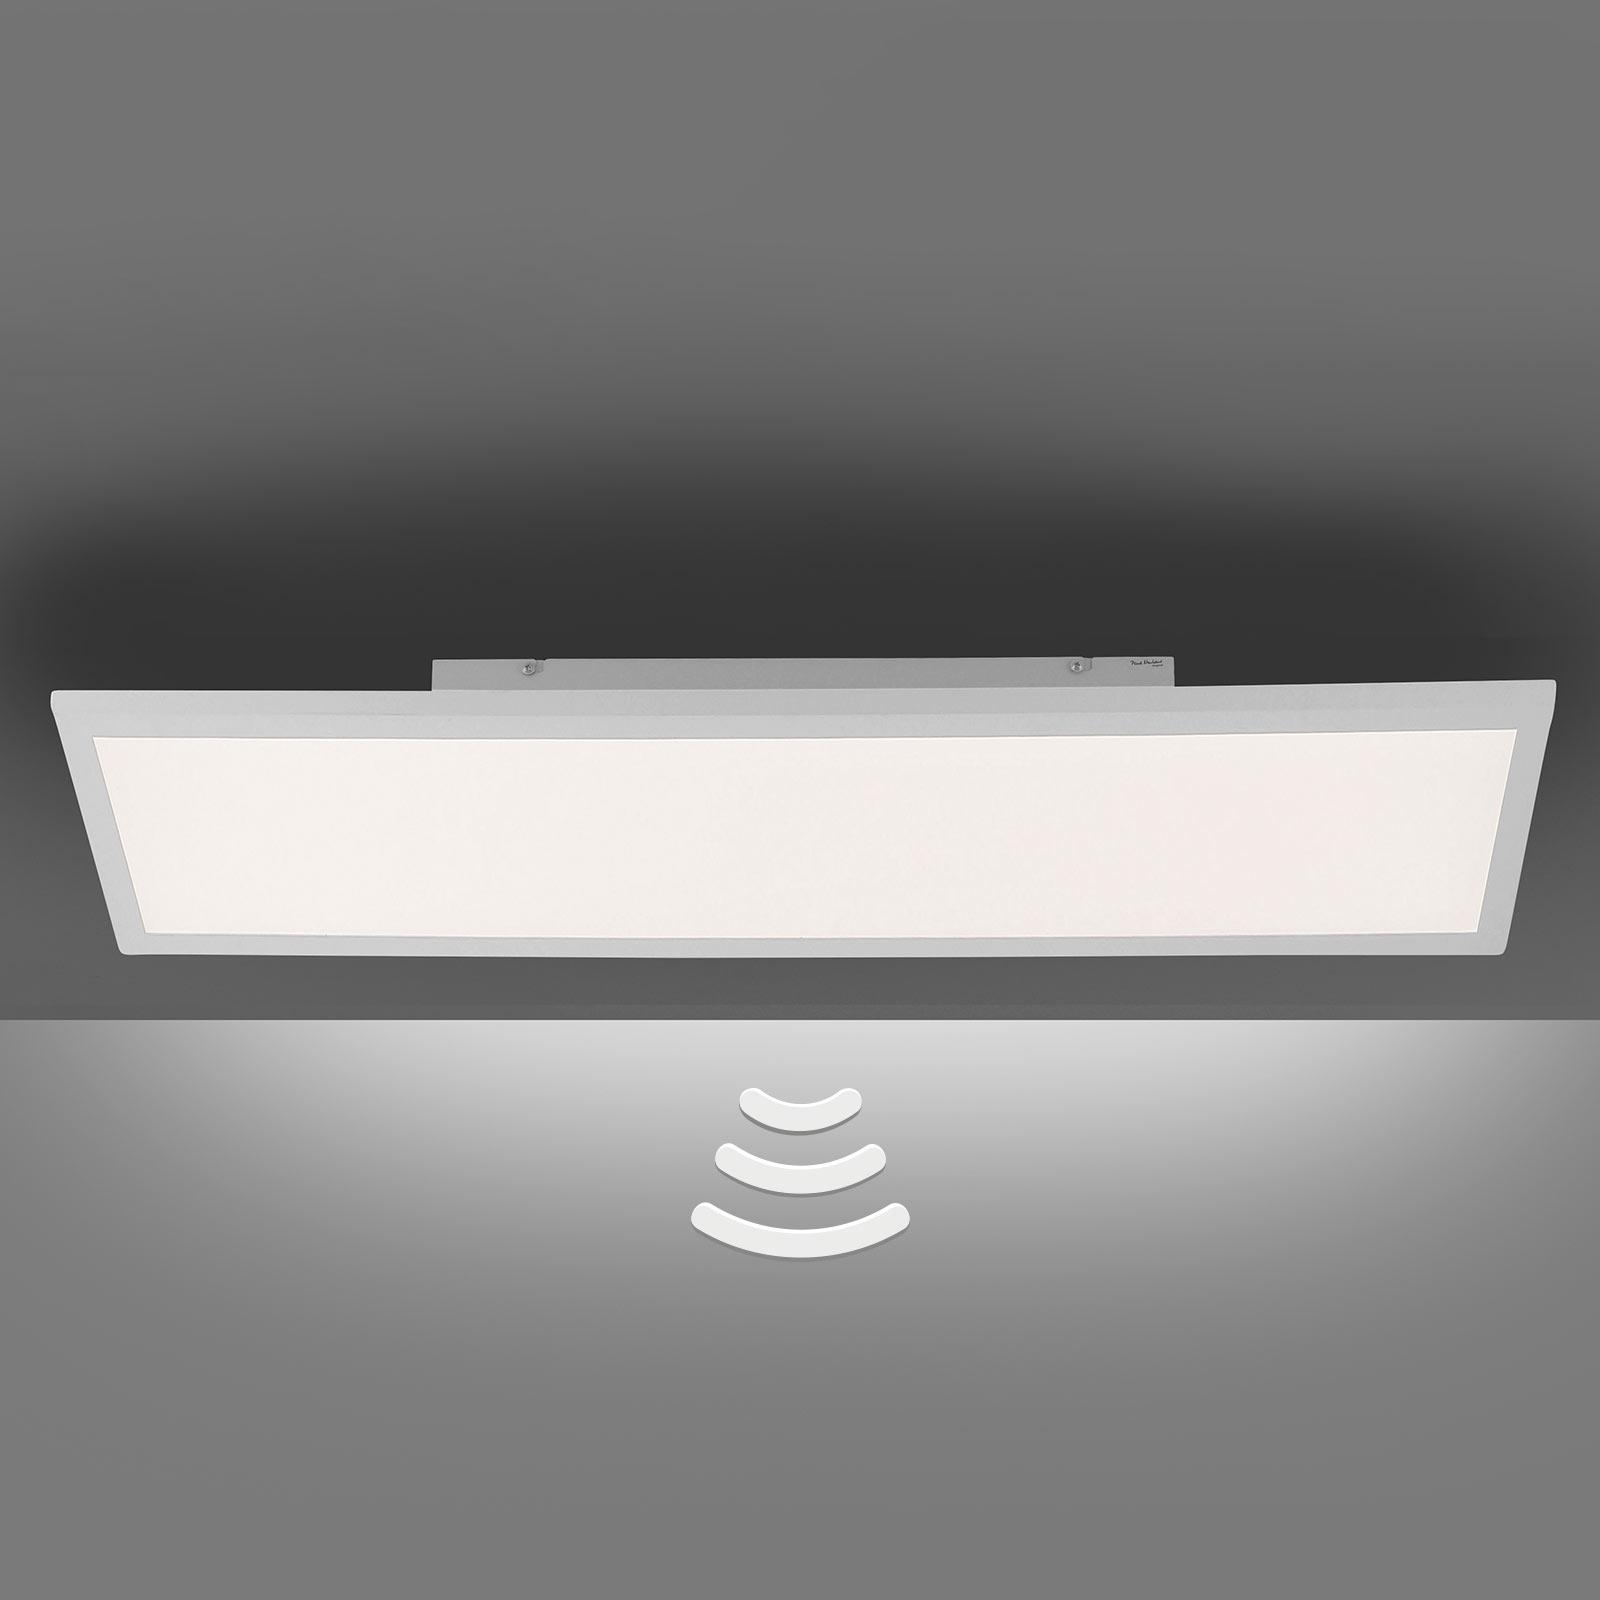 LED plafondlamp Fleet met bewegingsmelder 60x30 cm